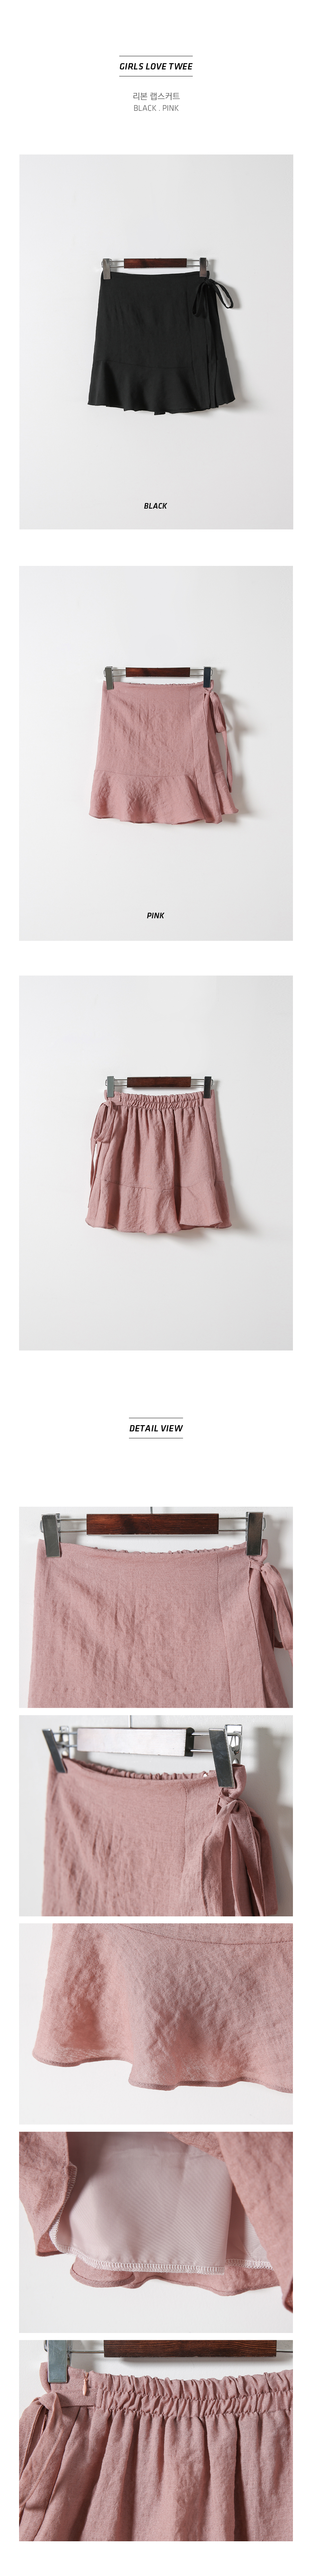 Ribbon wrap skirt